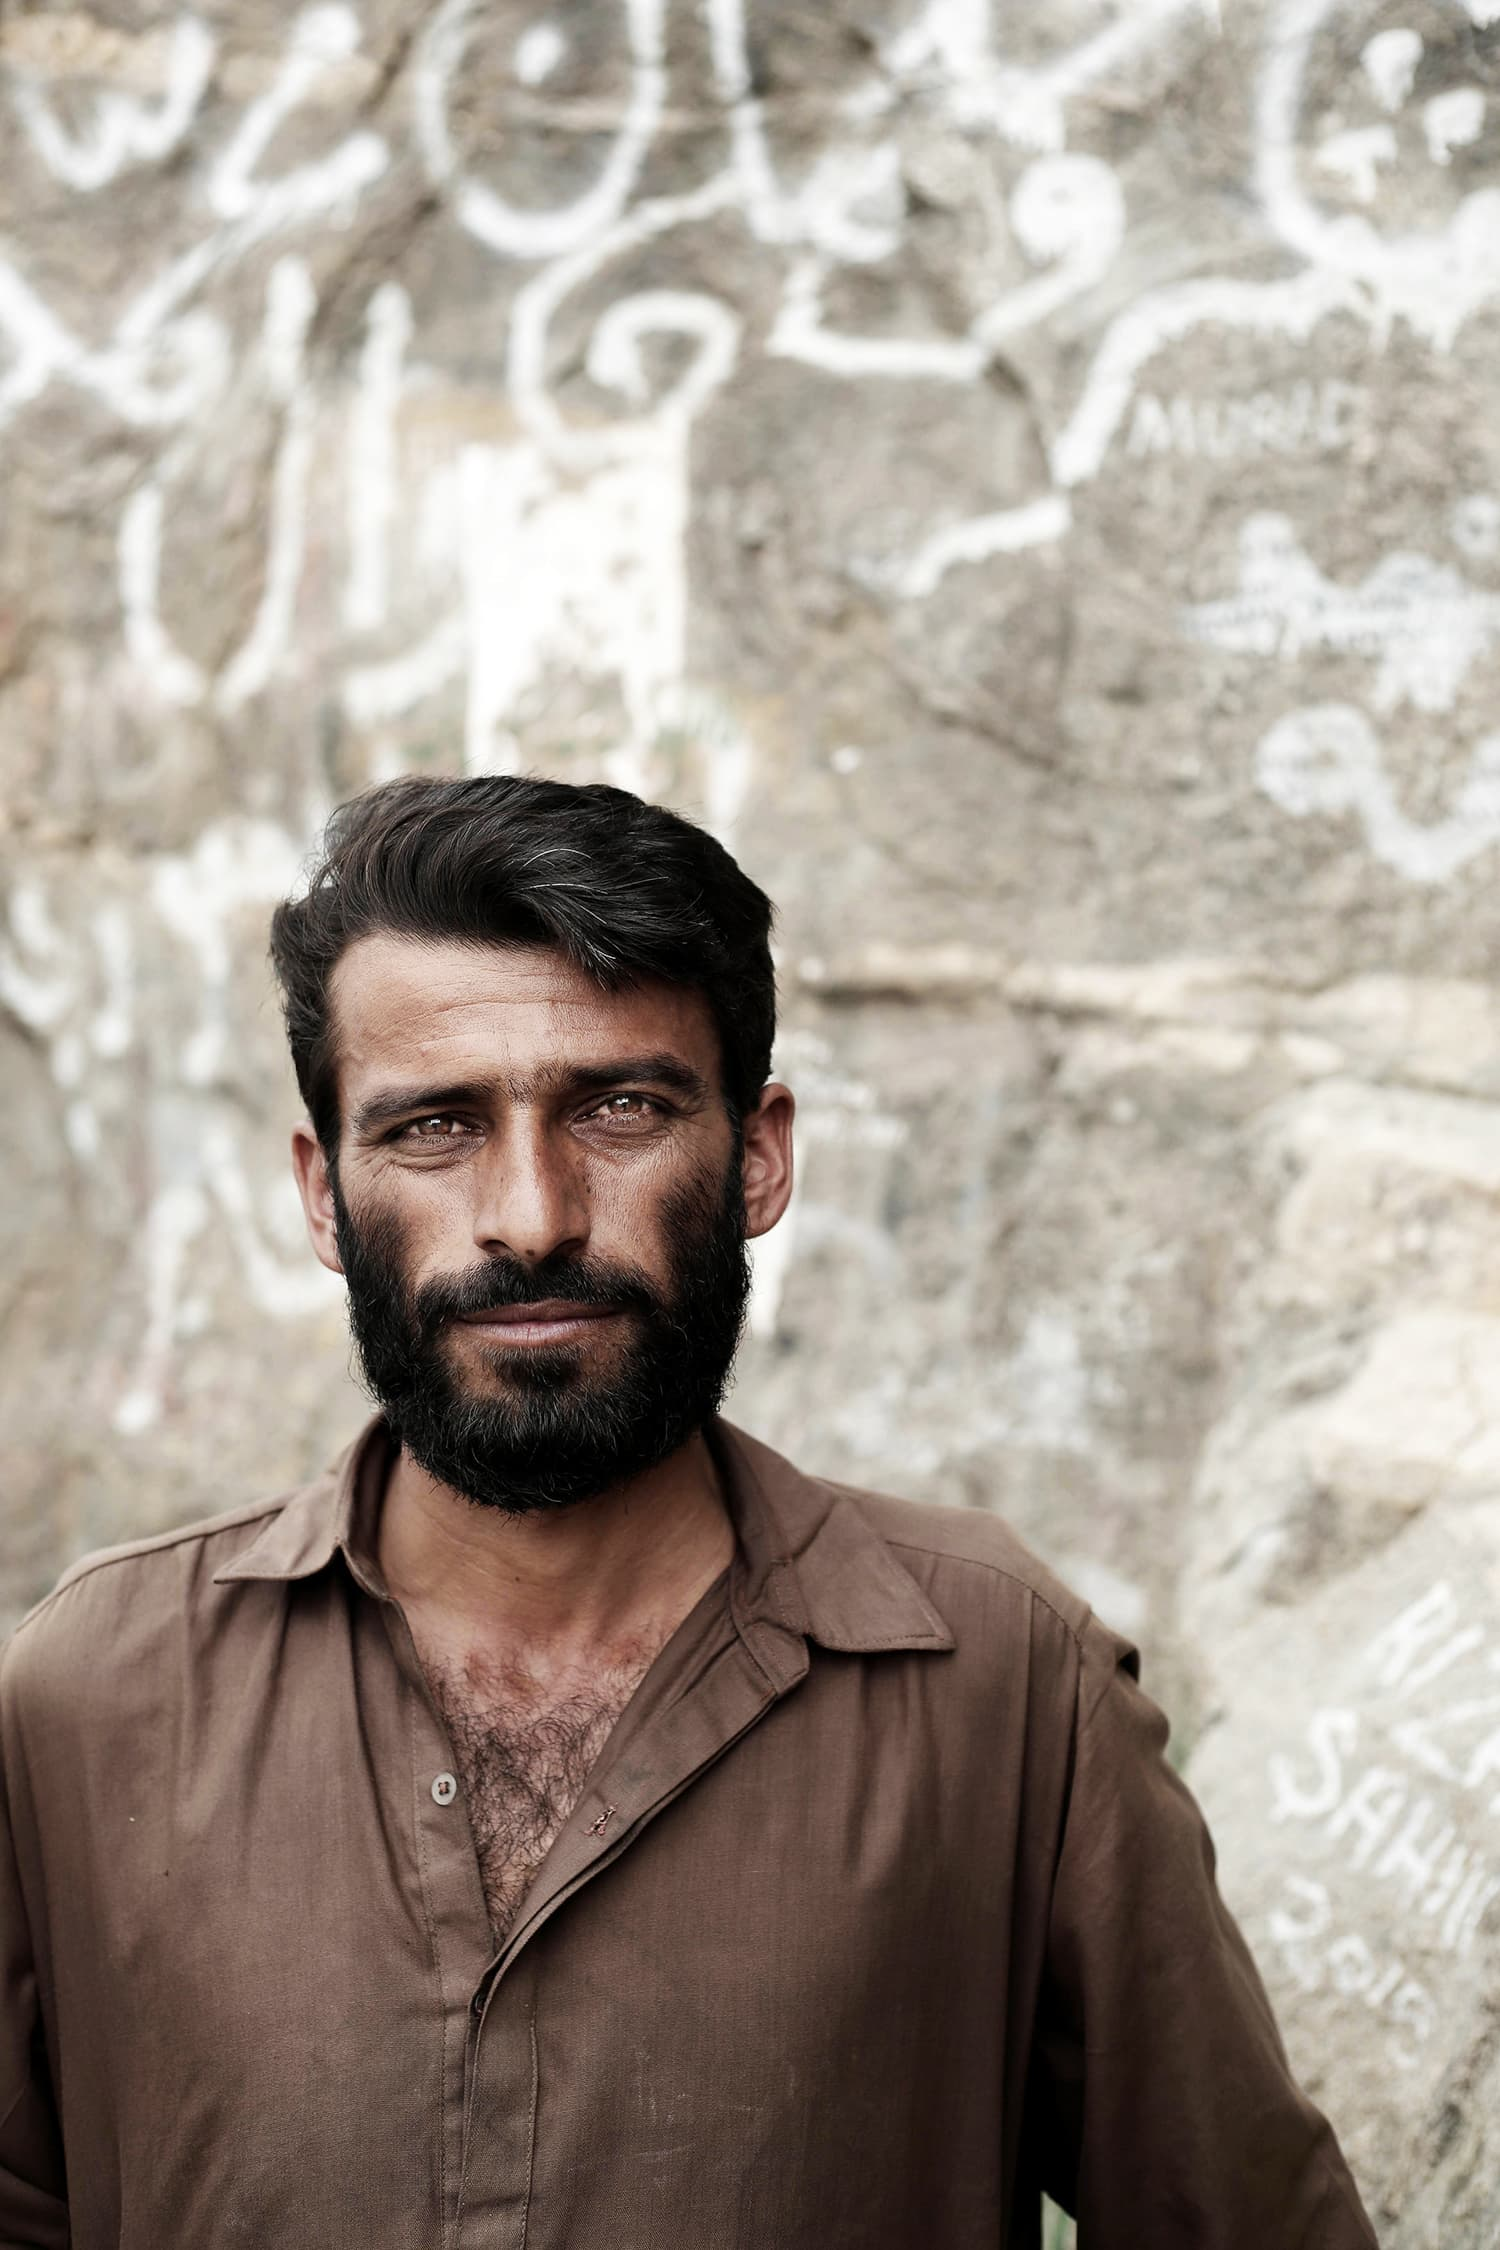 Sobdar Khan, 35, a Pakistani from Karachi poses for a portrait on Noor Mountain.— AP